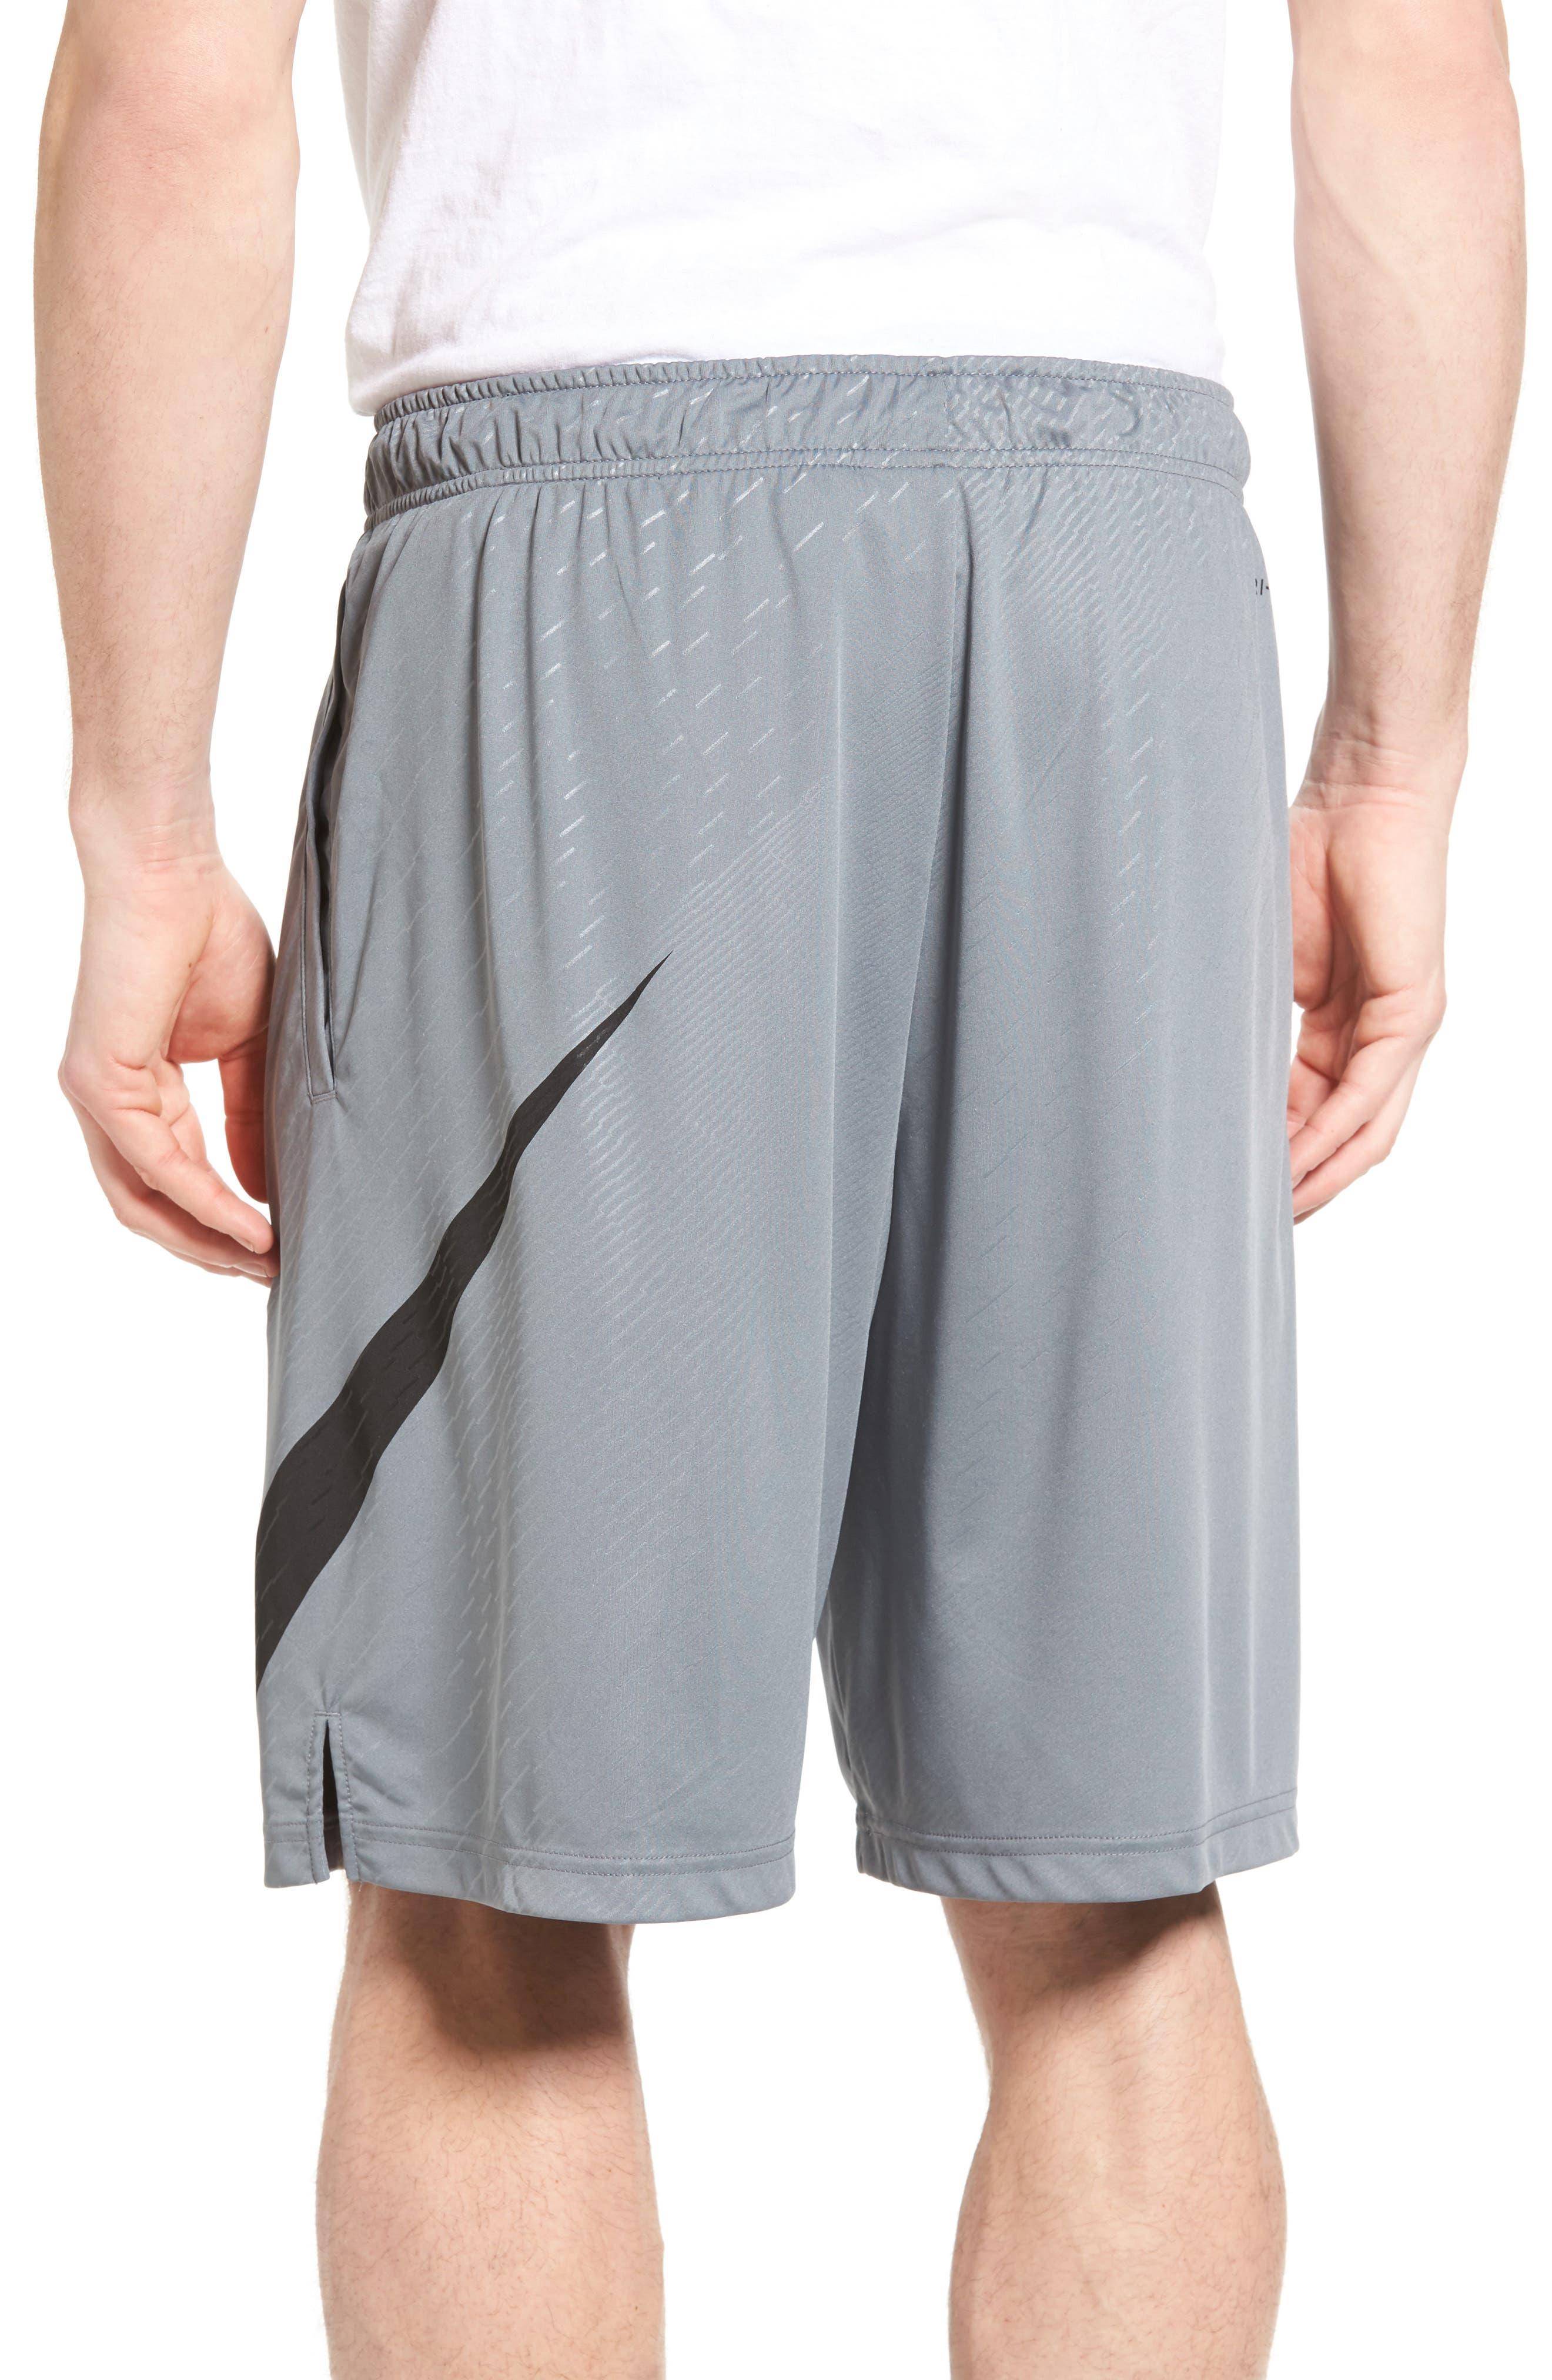 Dry Training Shorts,                             Alternate thumbnail 4, color,